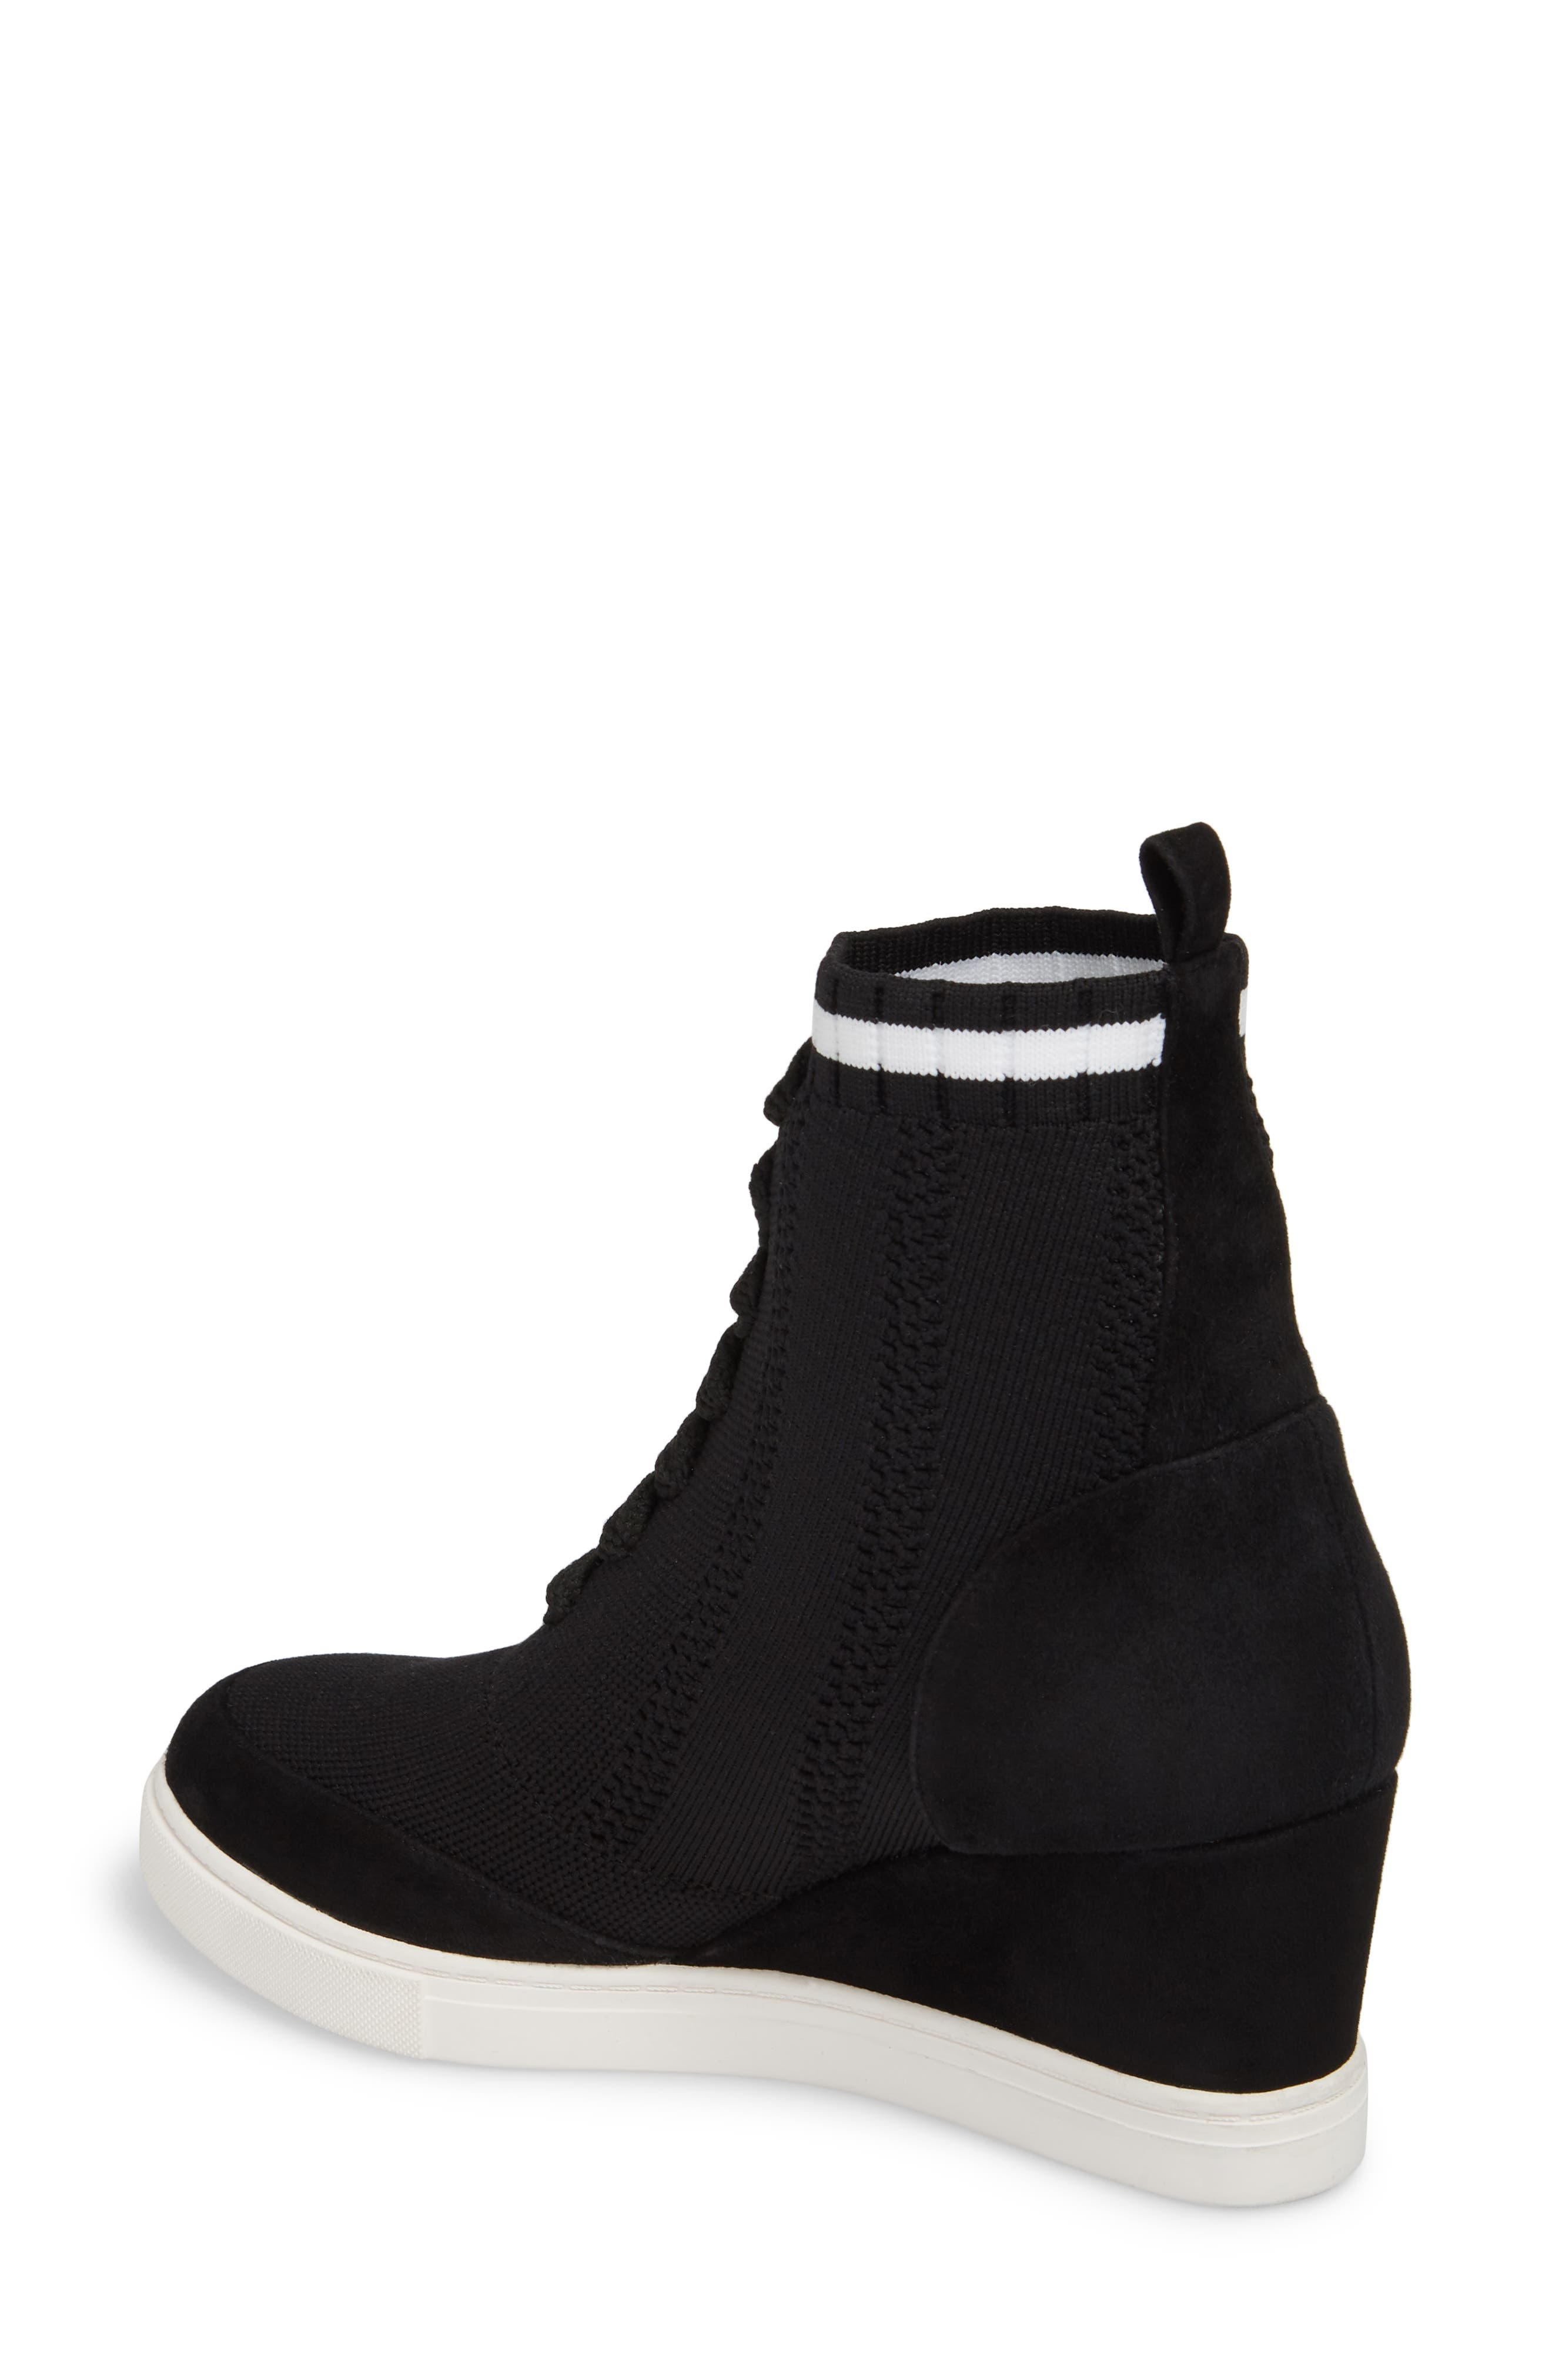 LINEA PAOLO,                             Fabiana Wedge Sneaker,                             Alternate thumbnail 2, color,                             BLACK SUEDE